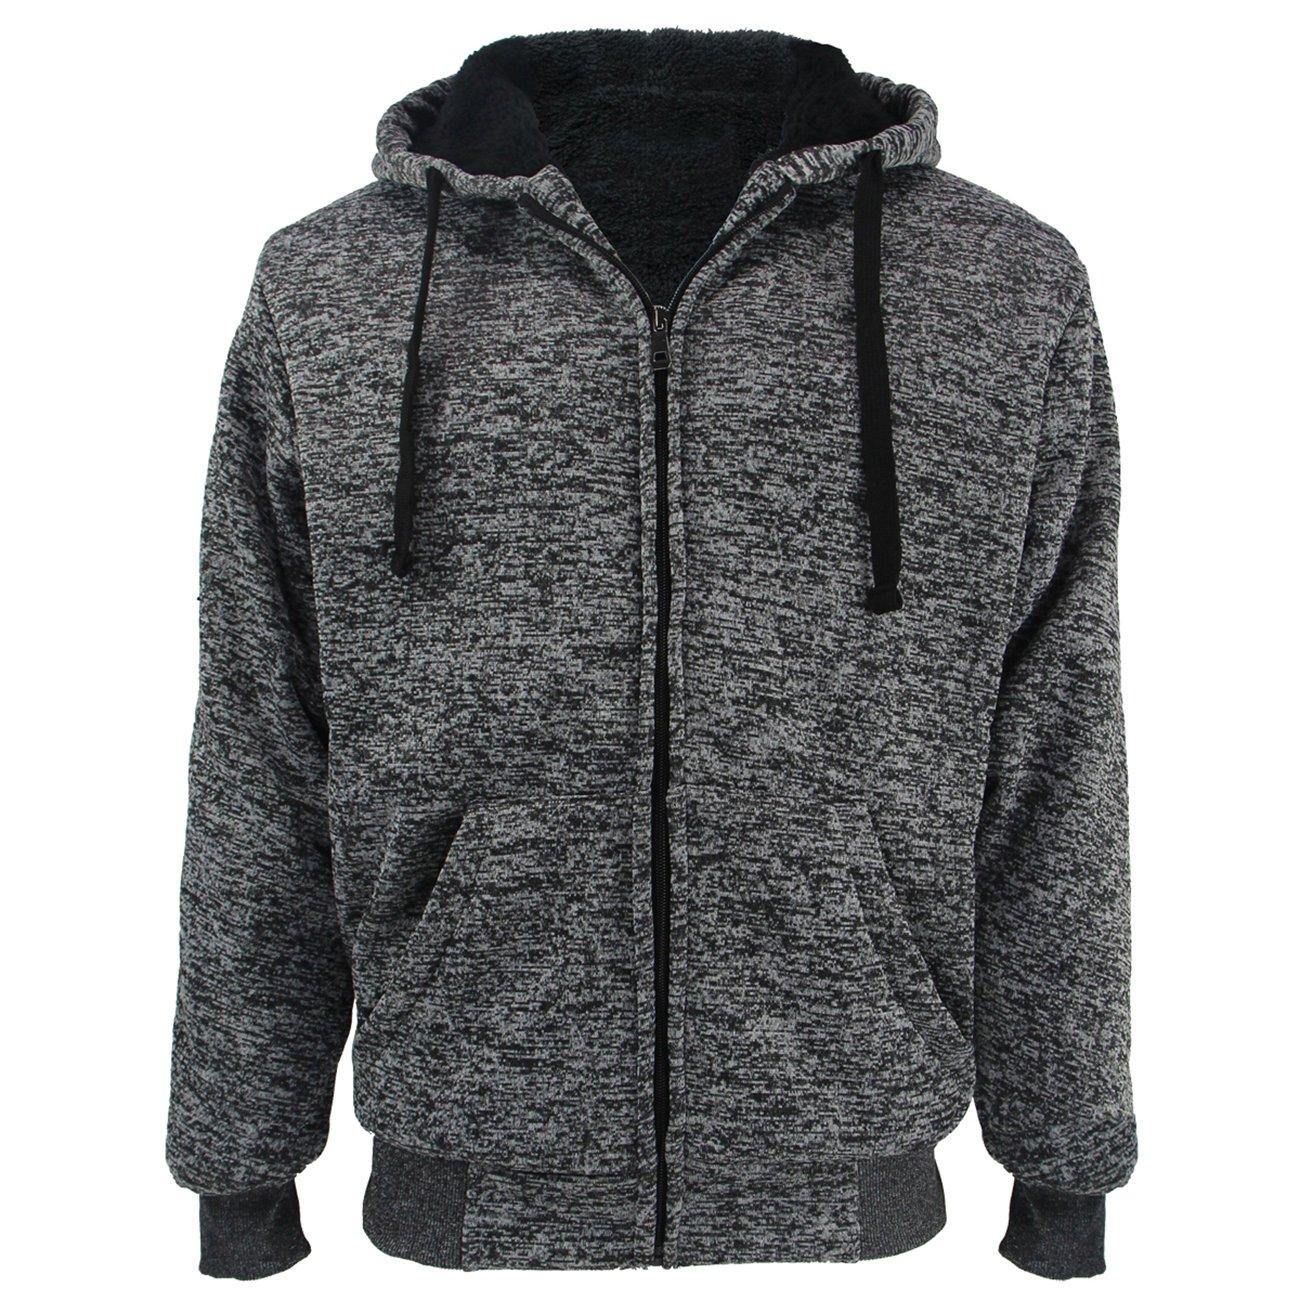 TanBridge Heavyweight Sherpa Lined Plus Sizes Warm Fleece Full Zip Mens Hoodie with Padded Sleeve & Rib Cuffs Charcoal 2XL by TanBridge